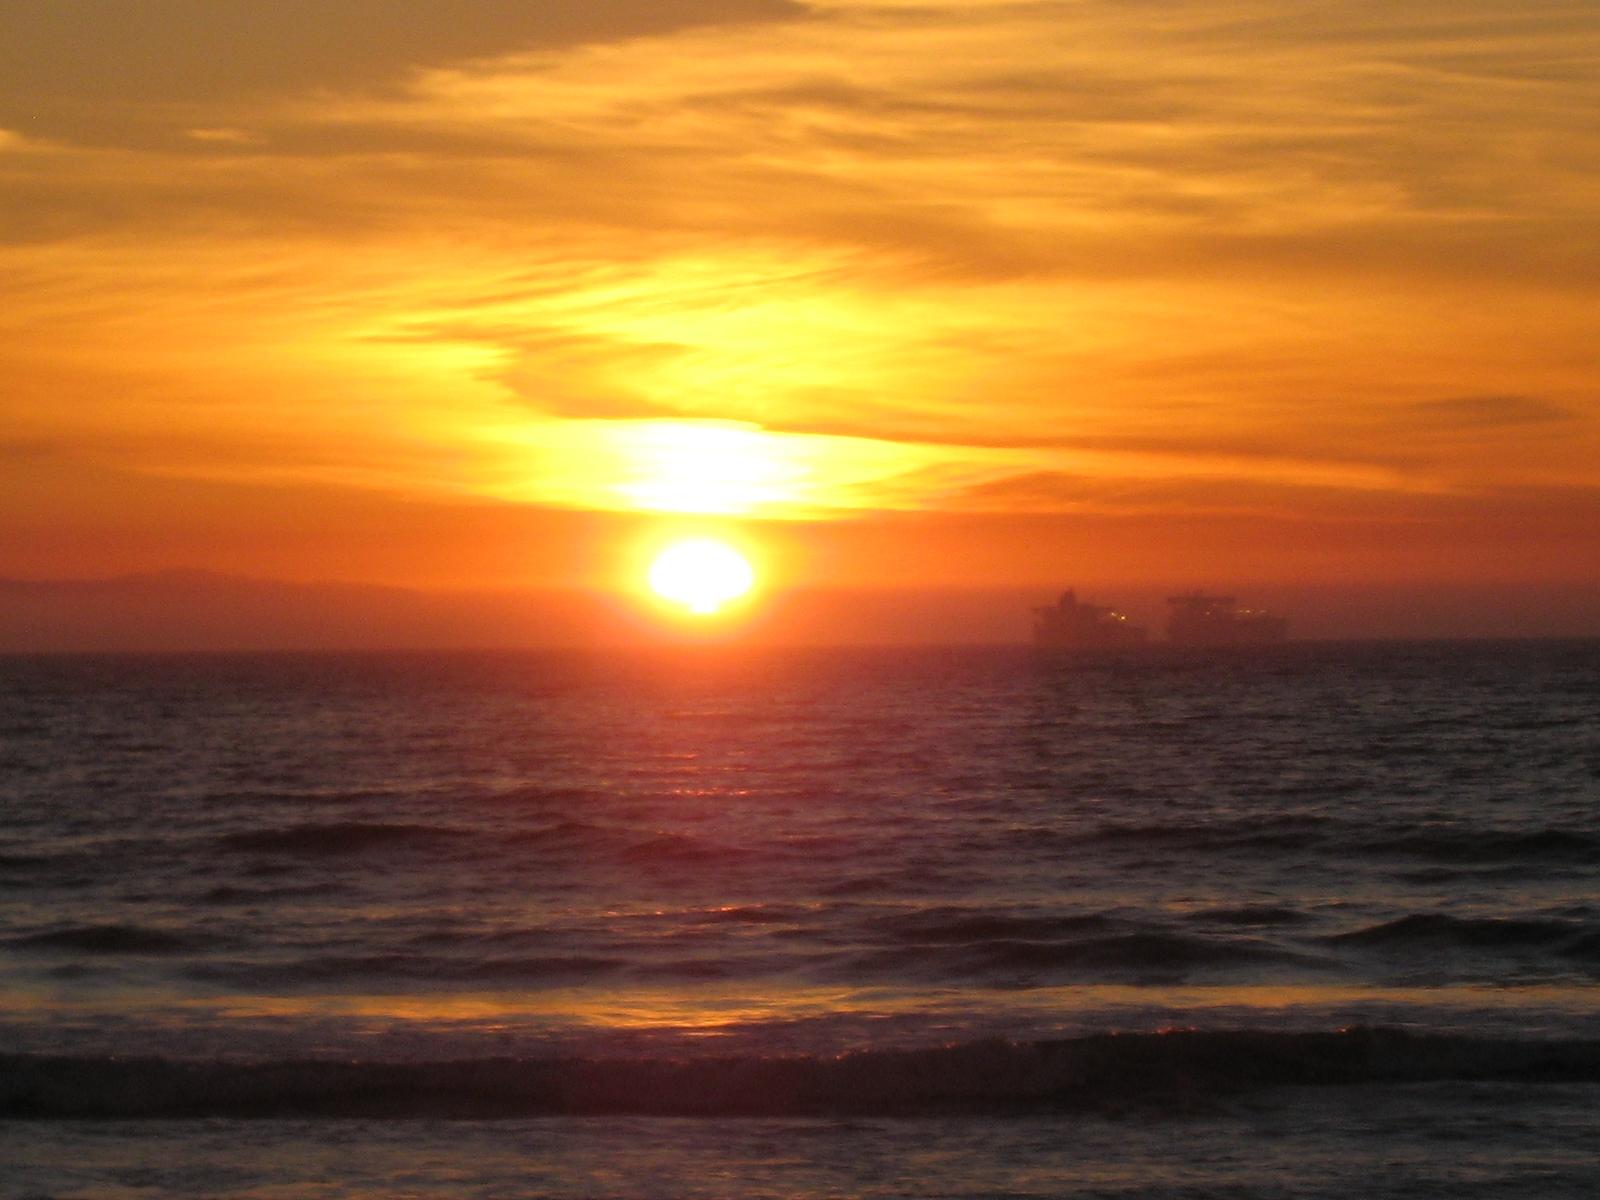 HUNTINGTON BEACH SUNSET BEACH KIDS PLAYING ON BURMS ...